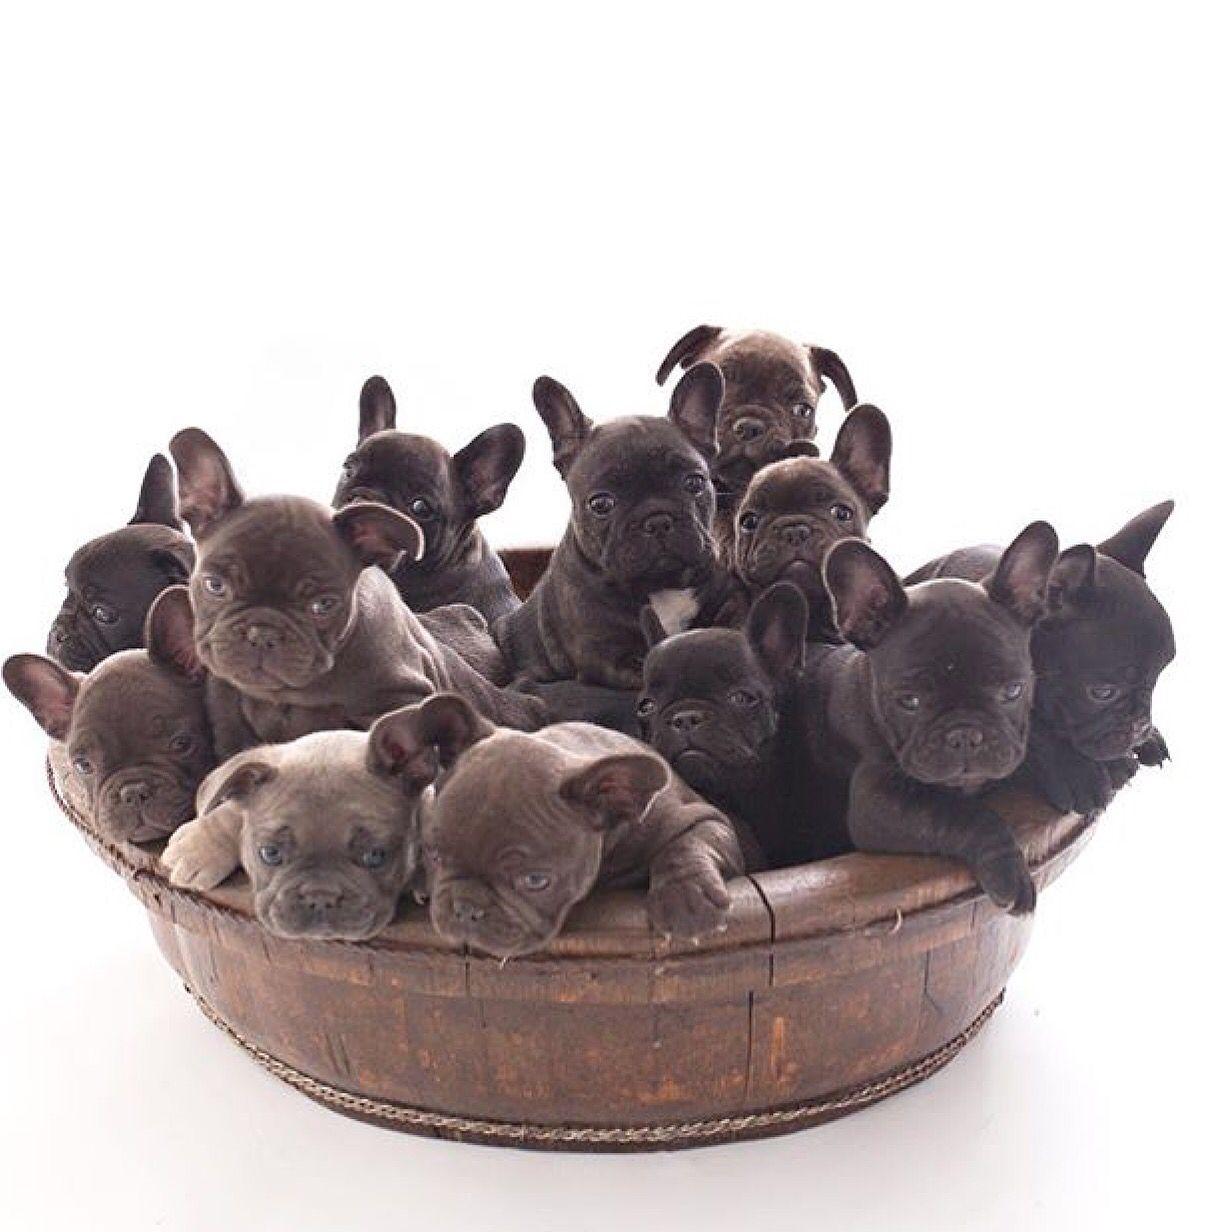 Basket Full Of Puppies Bulldog Puppies French Bulldog Puppies